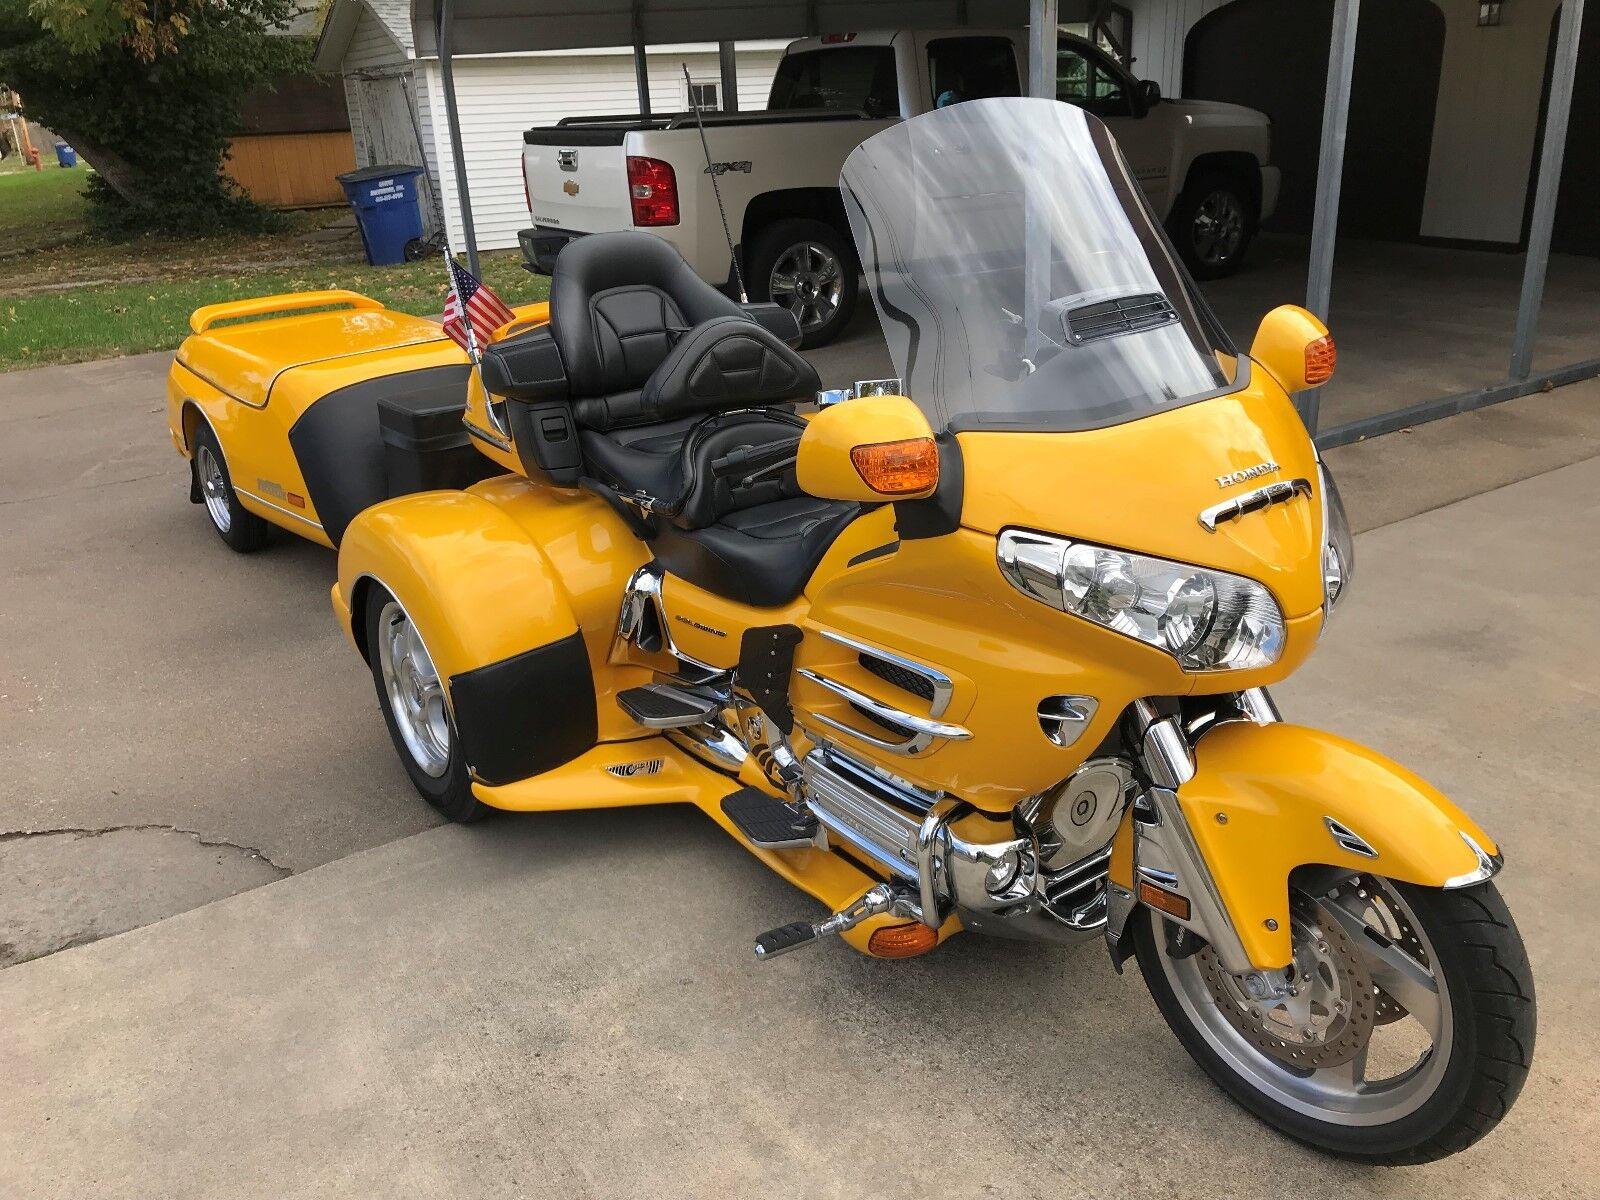 2010 Honda Gold Wing  2010 Honda 1800 Goldwing Trike, Champion Trike conversion